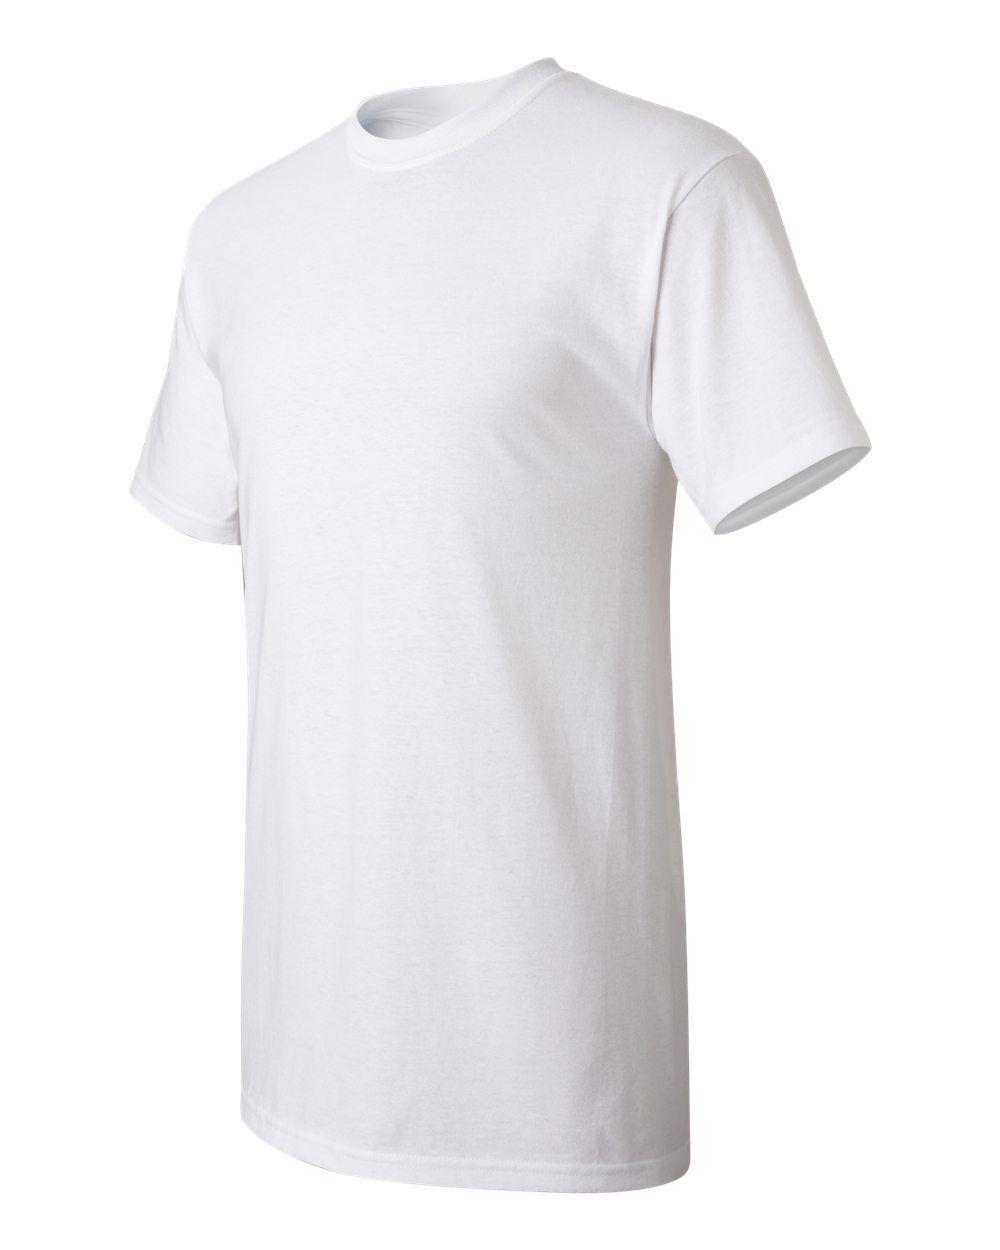 50 New Wholesale Hanes ComfortSoft 100% Cotton White Adult T-Shirts S M L XL